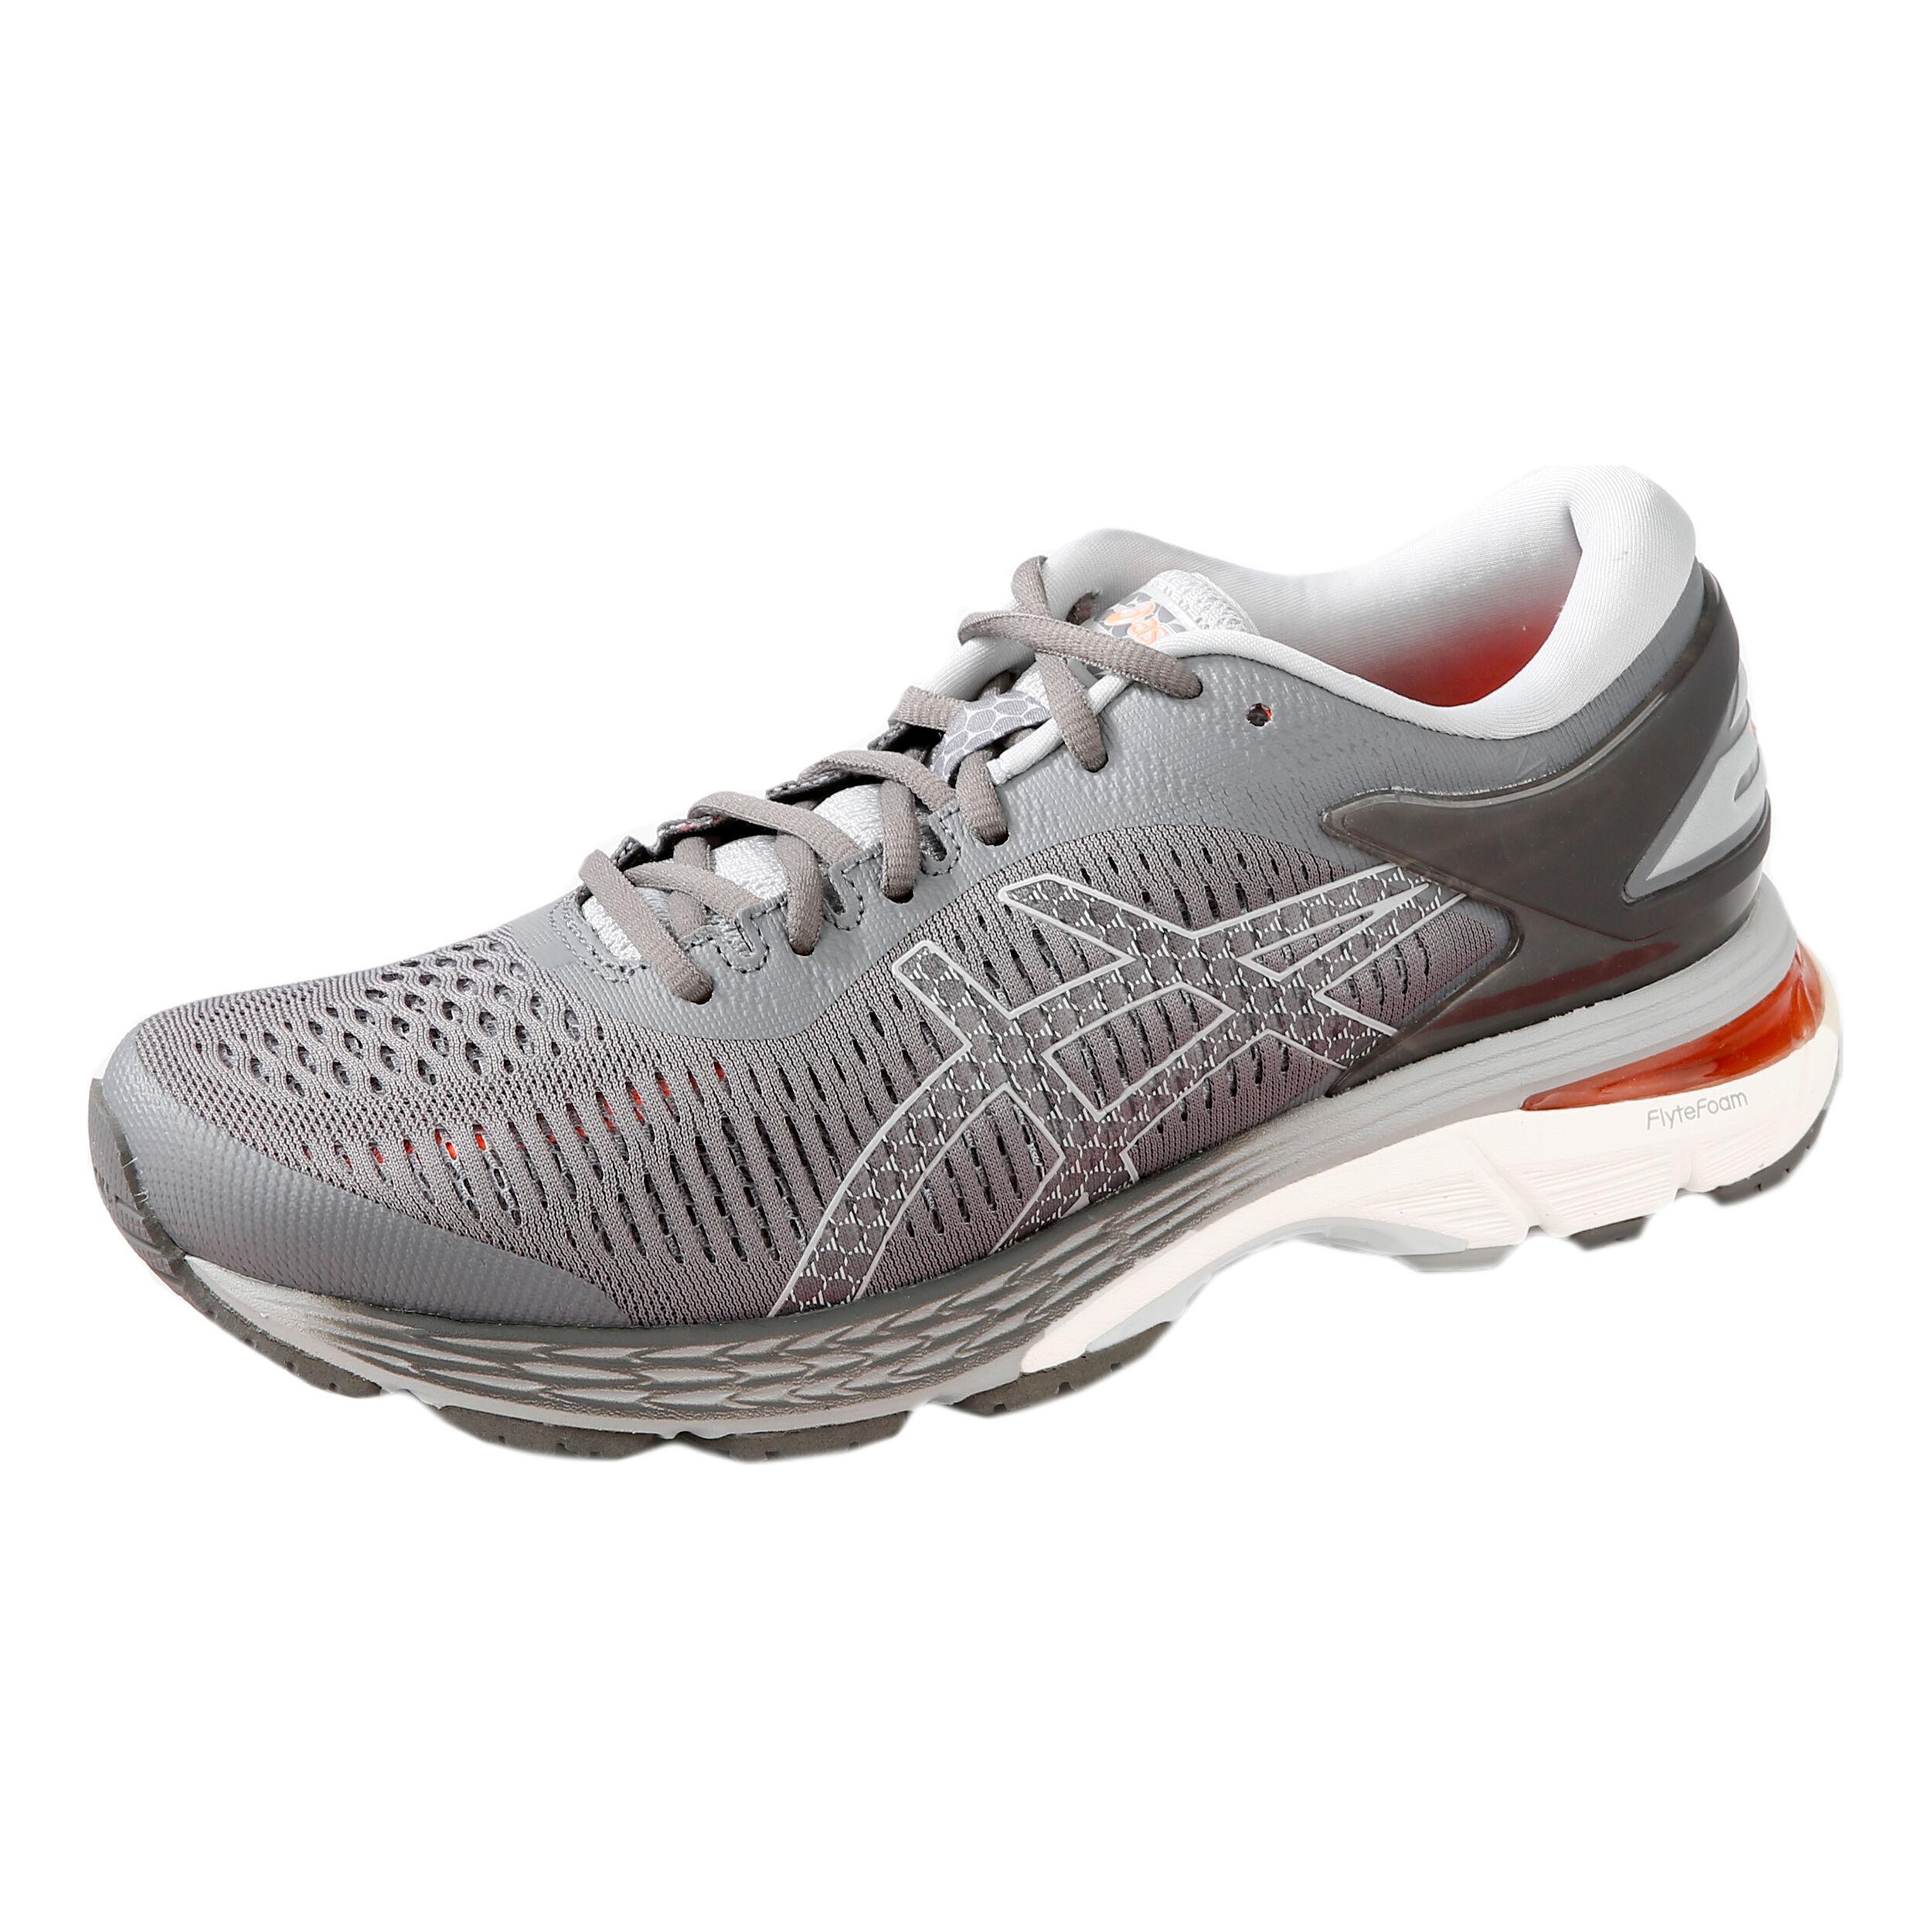 buy Asics Gel-Kayano 25 Stability Running Shoe Women - Grey, White ...